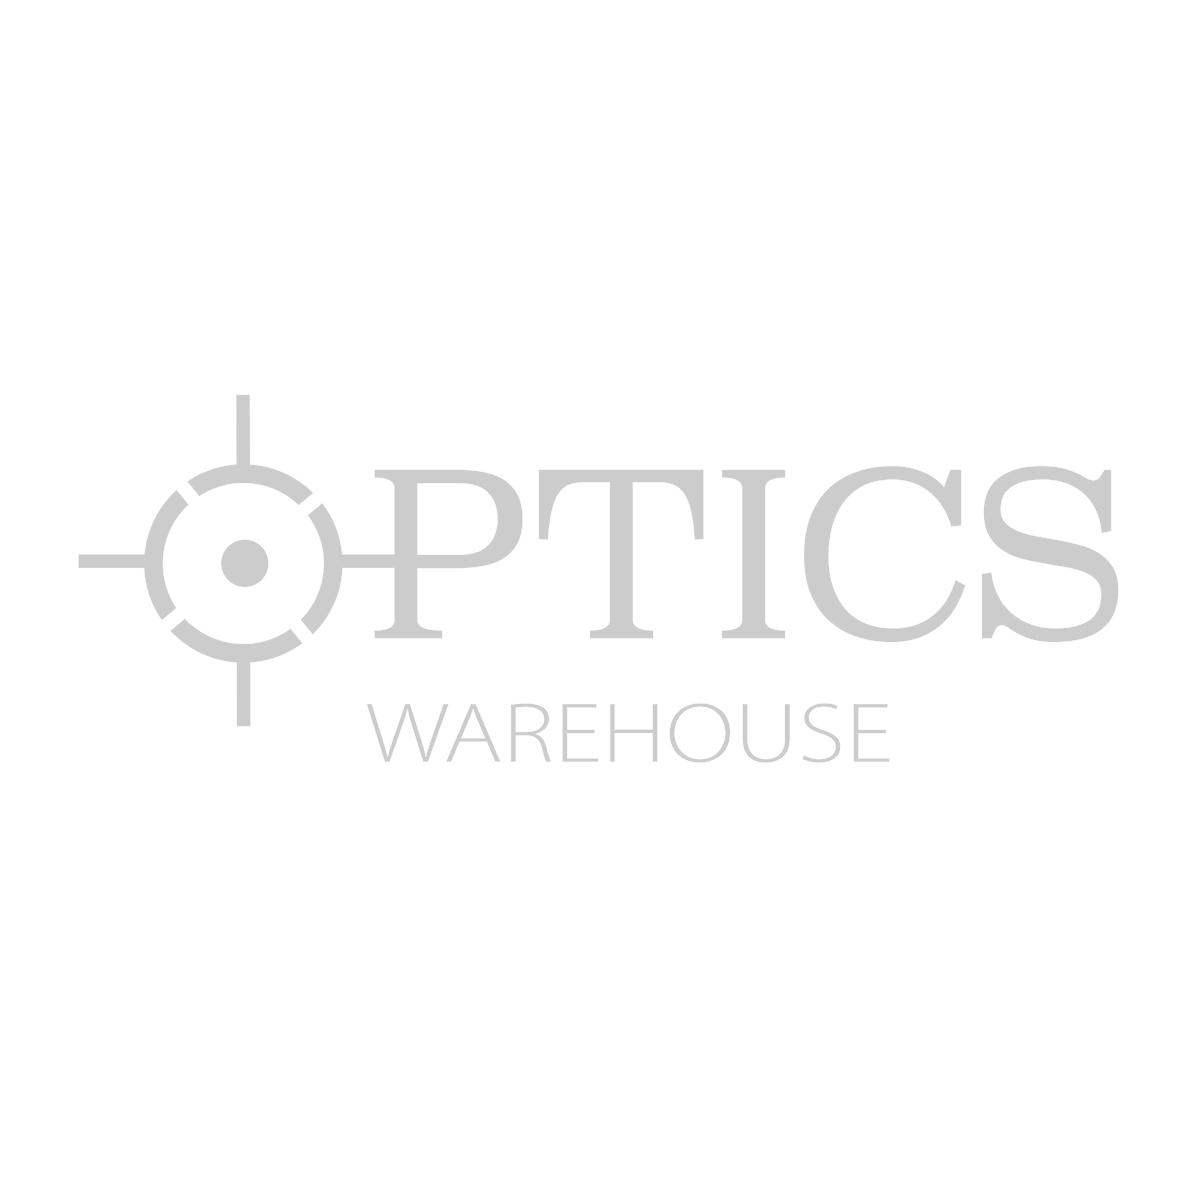 MK Machining Athlon Ares BTR/ETR/Midas Tac Pro Series Throw Lever